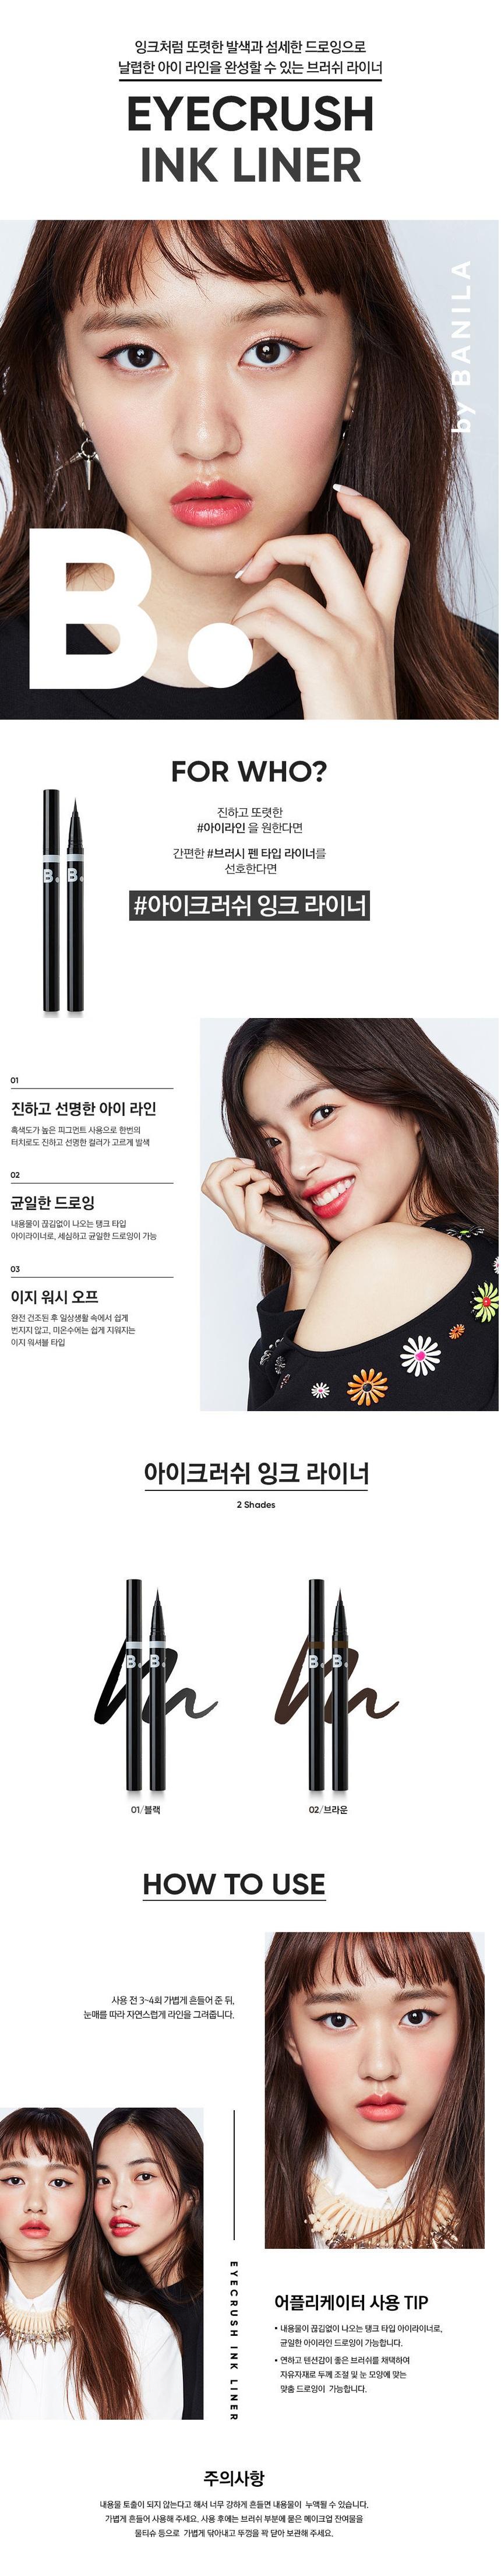 Banila Co Eyecrush Ink Liner korean cosmetic makeup product online shop malaysia singapore macau1